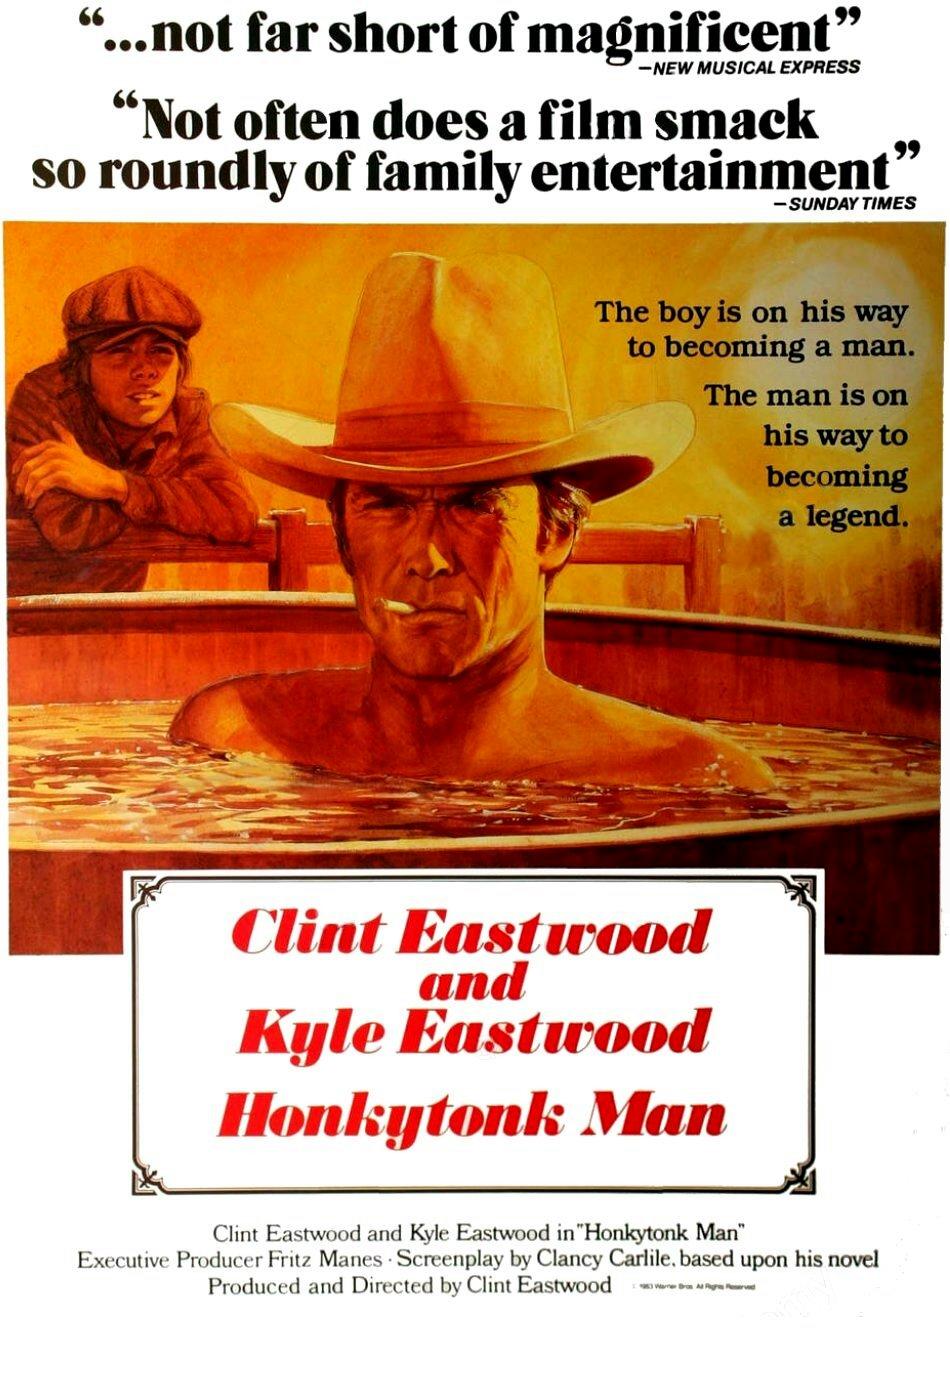 HONKYTONK MAN Movie Poster RARE Clint Eastwood Western